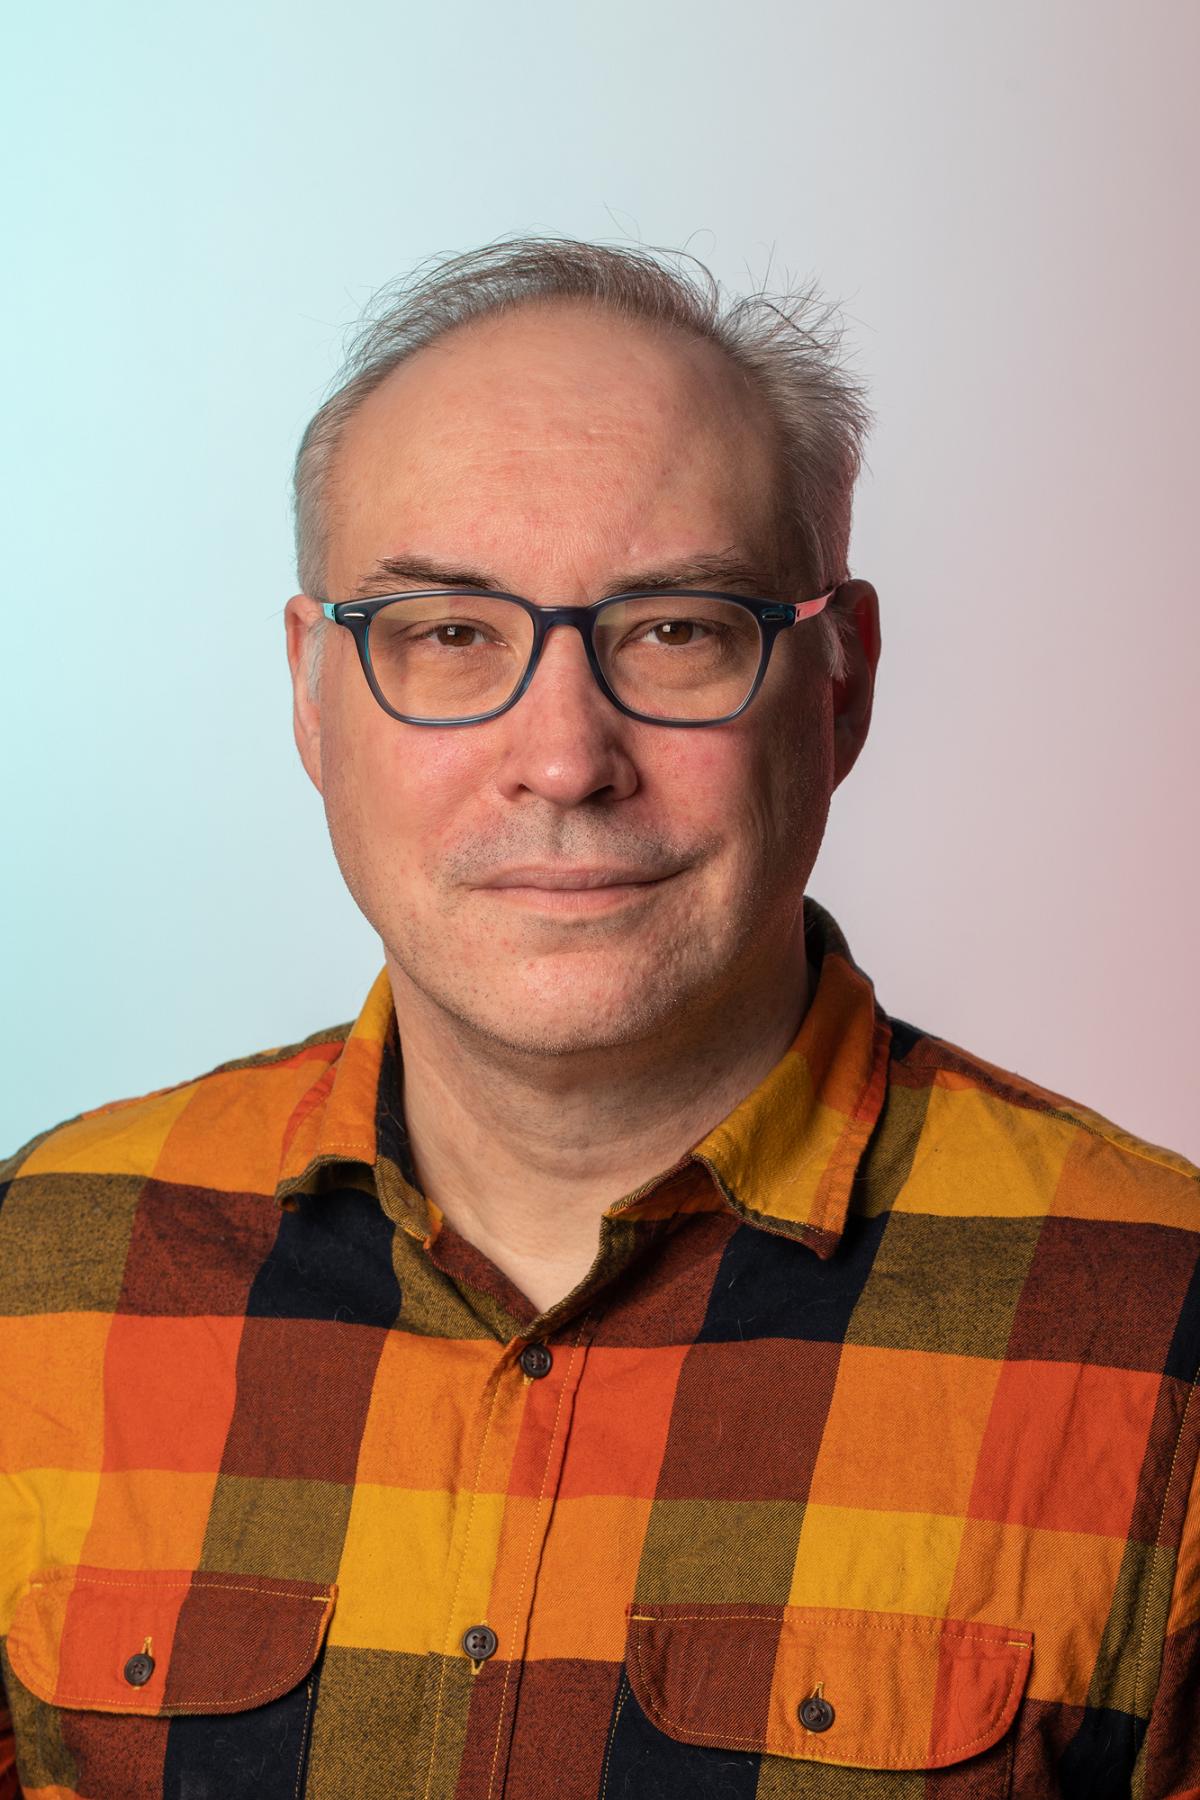 Patrick Sauriol